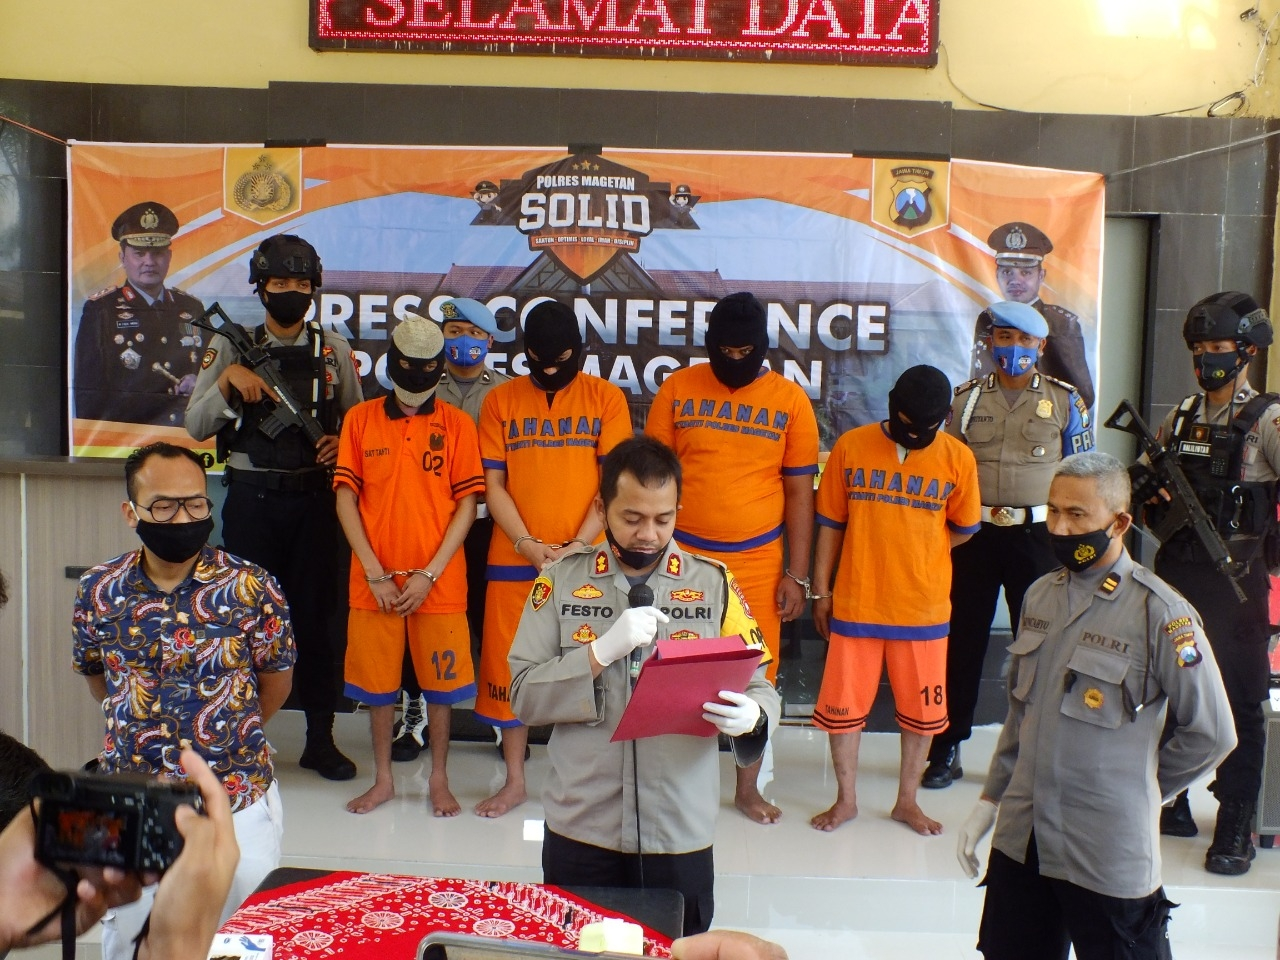 Polisi Magetan Amankan Pedagang Yang Membawa 91 Jerigen Arak Jawa Yang Omsetnya  Puluhan Juta